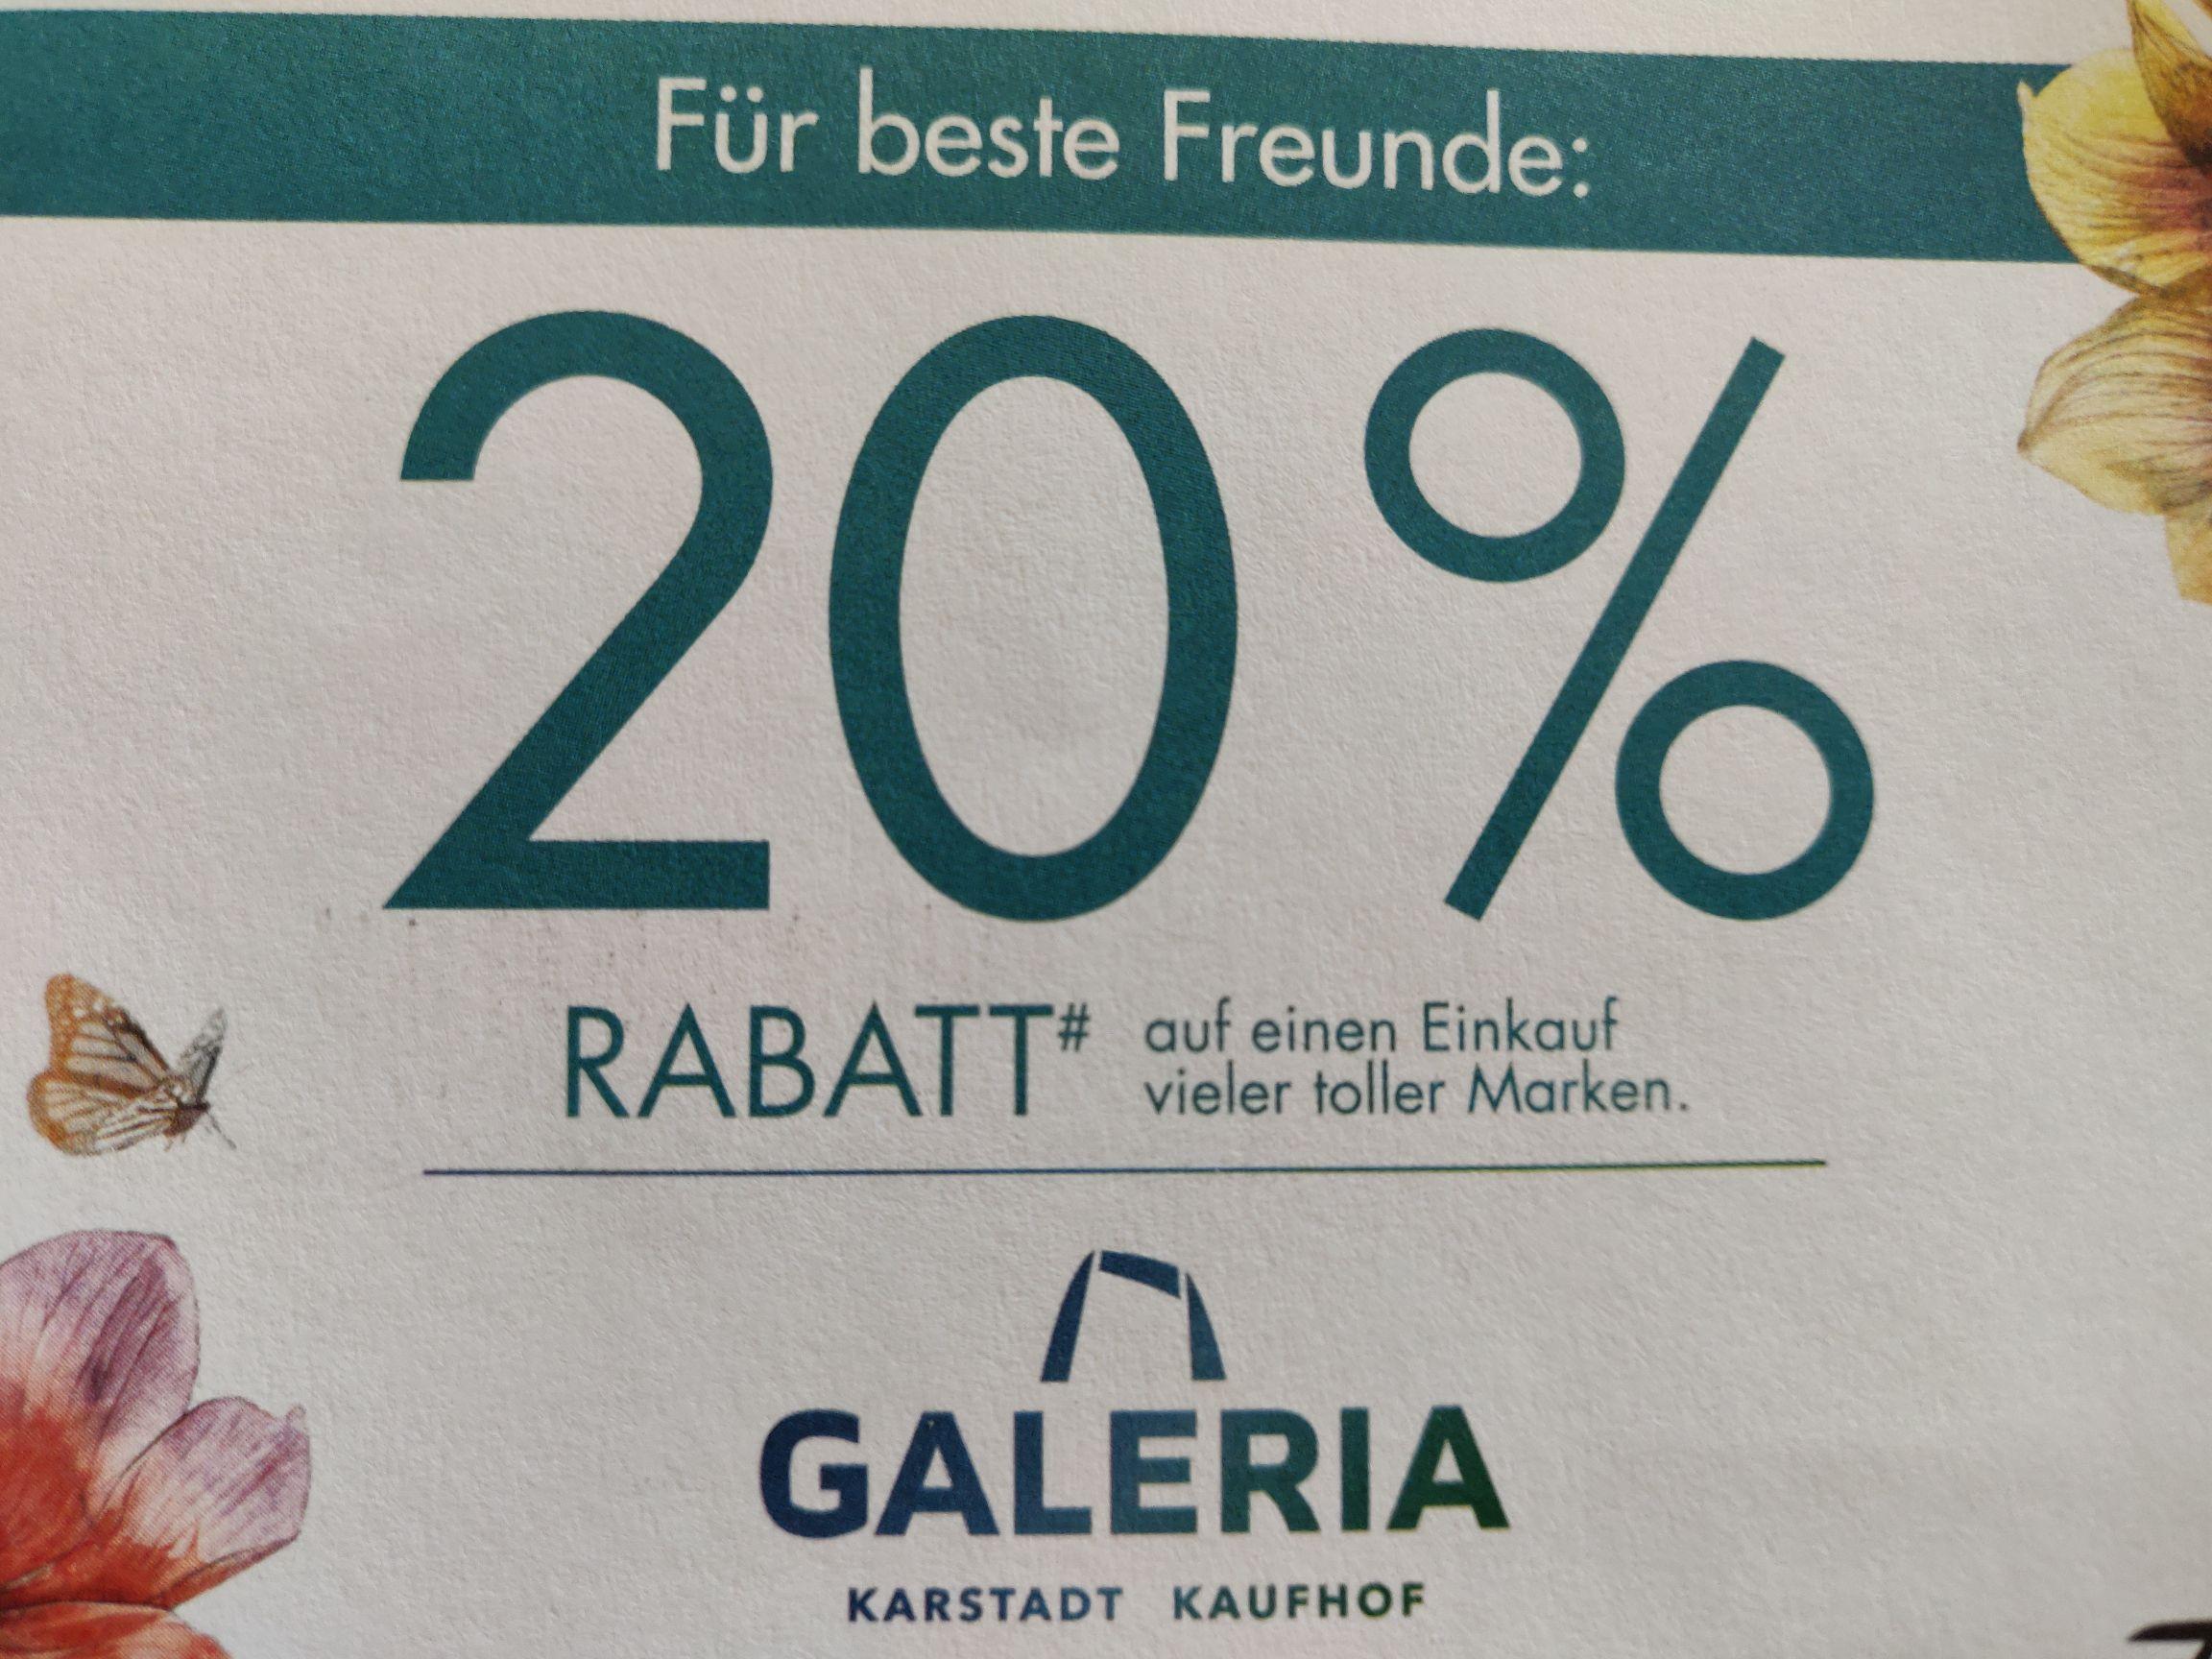 Galeria Kaufhof / Karstadt 20% Rabatt (online)